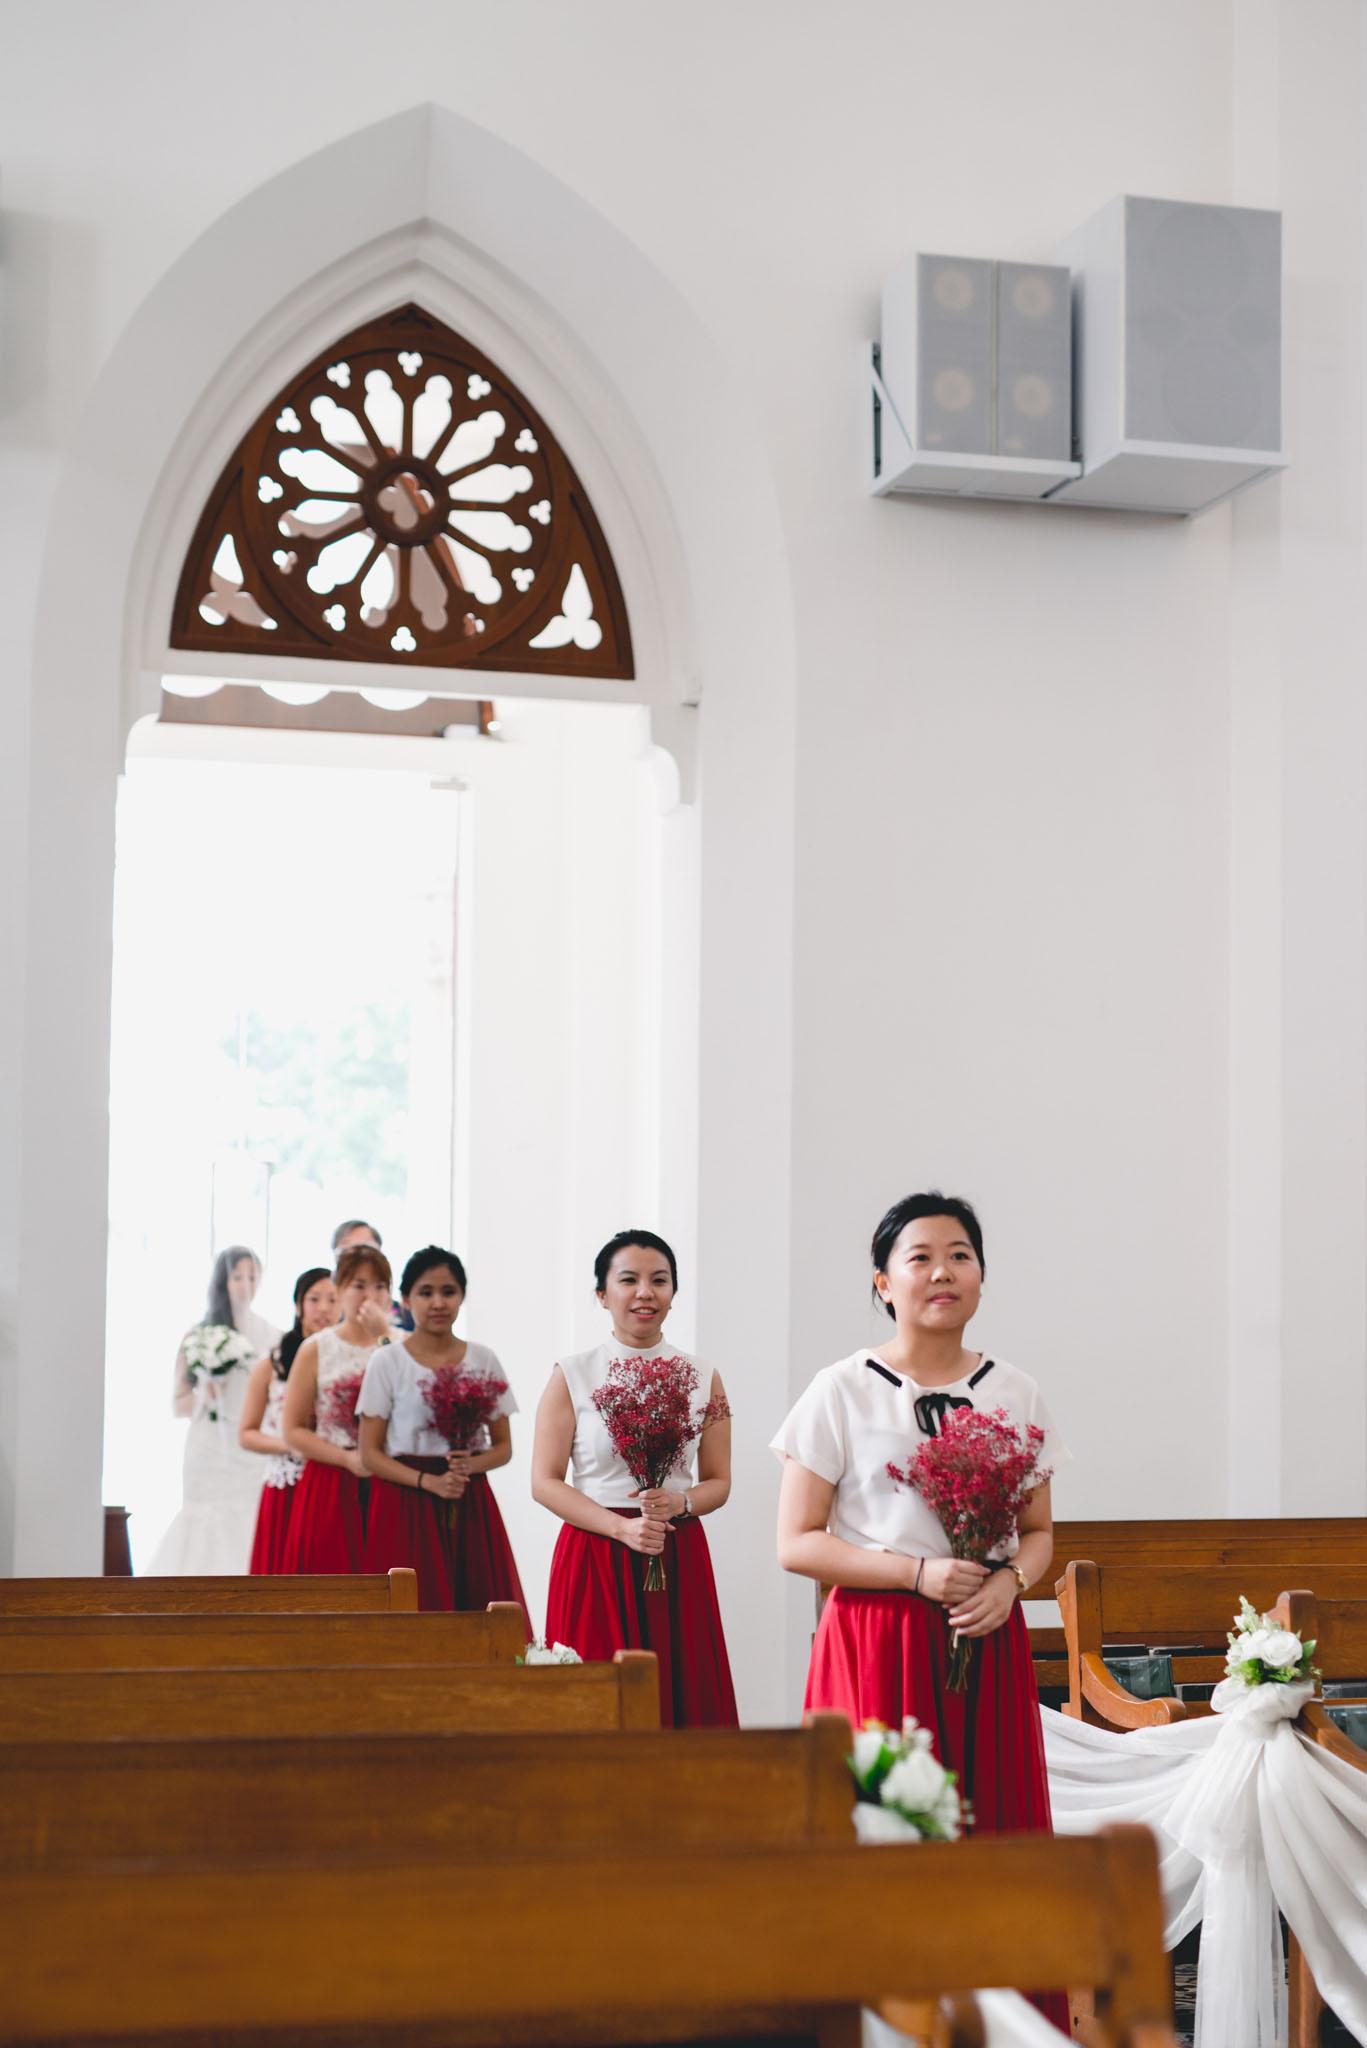 wedding church saints peter and paul 00018b.JPG